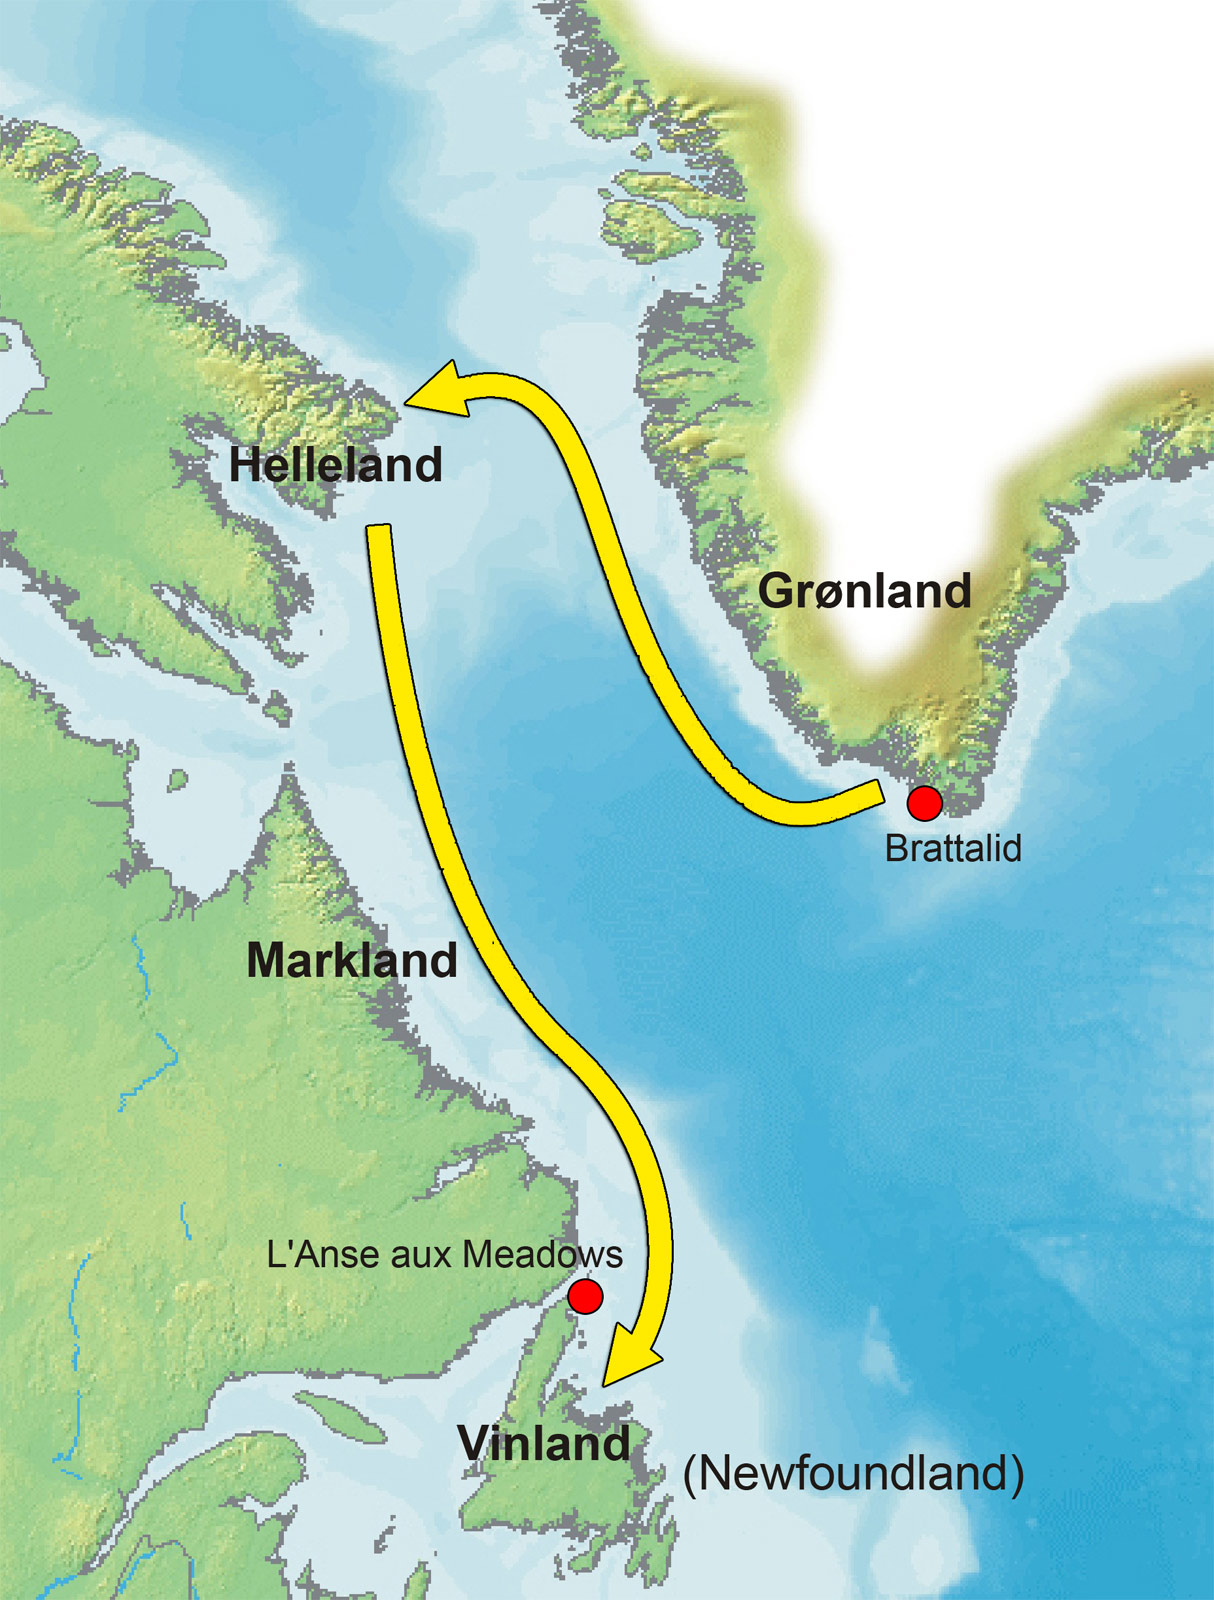 https://i0.wp.com/upload.wikimedia.org/wikipedia/commons/0/04/Vinland-travel.jpg